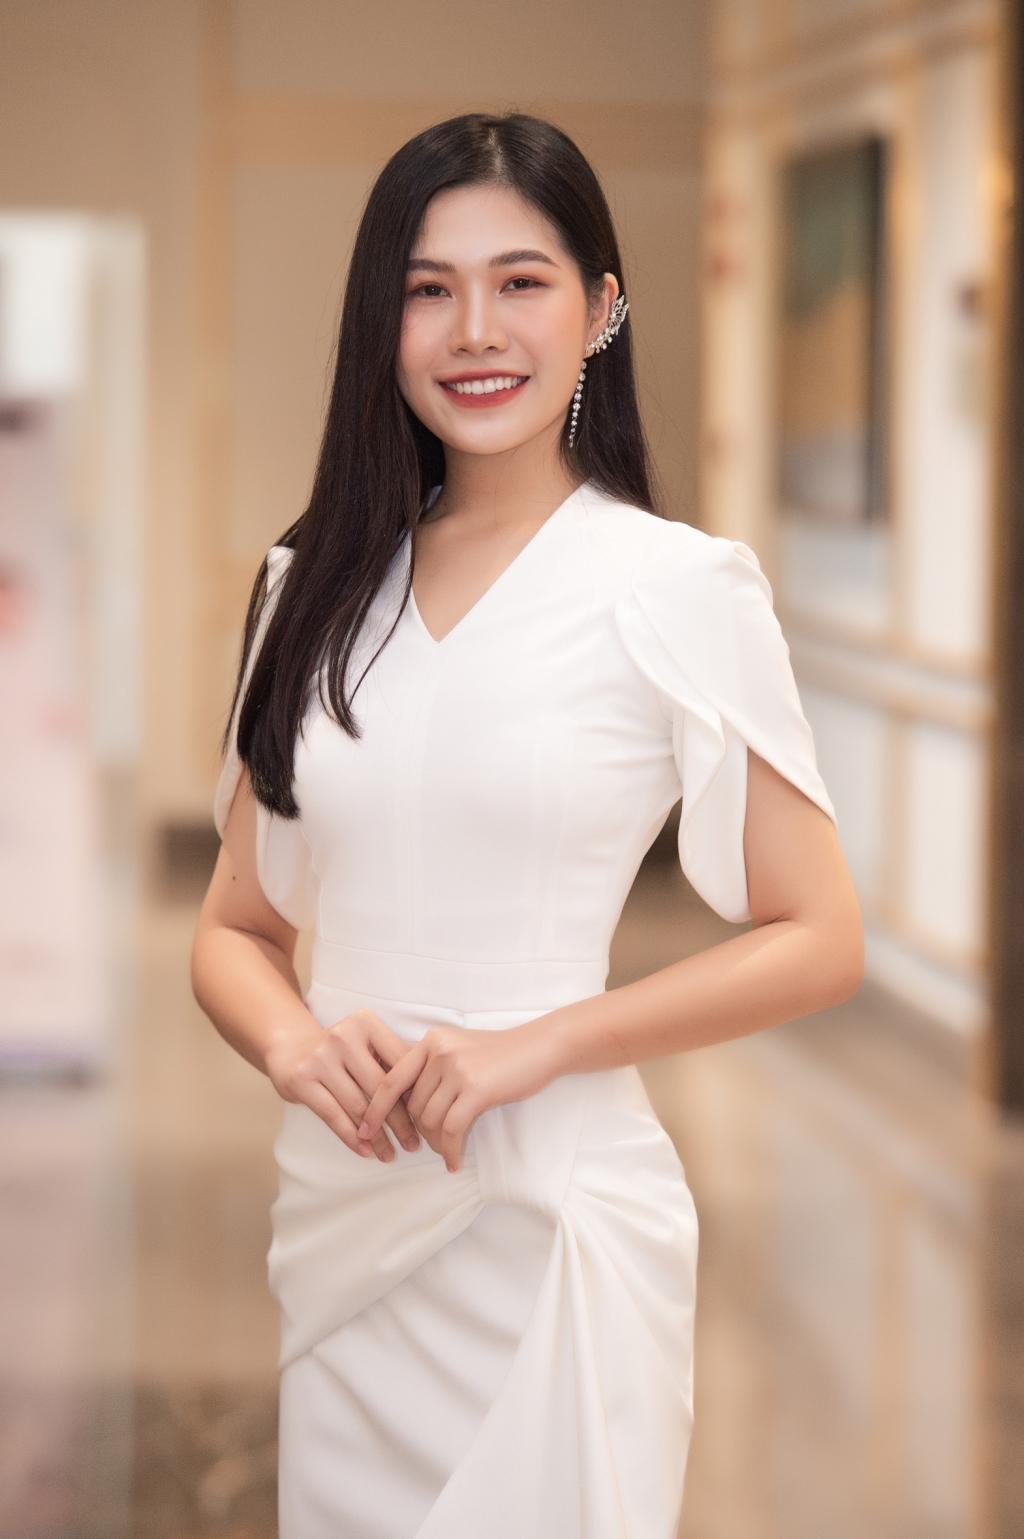 chiem nguong nhan sac cac thi sinh vong so khao phia bac hoa hau viet nam 2020